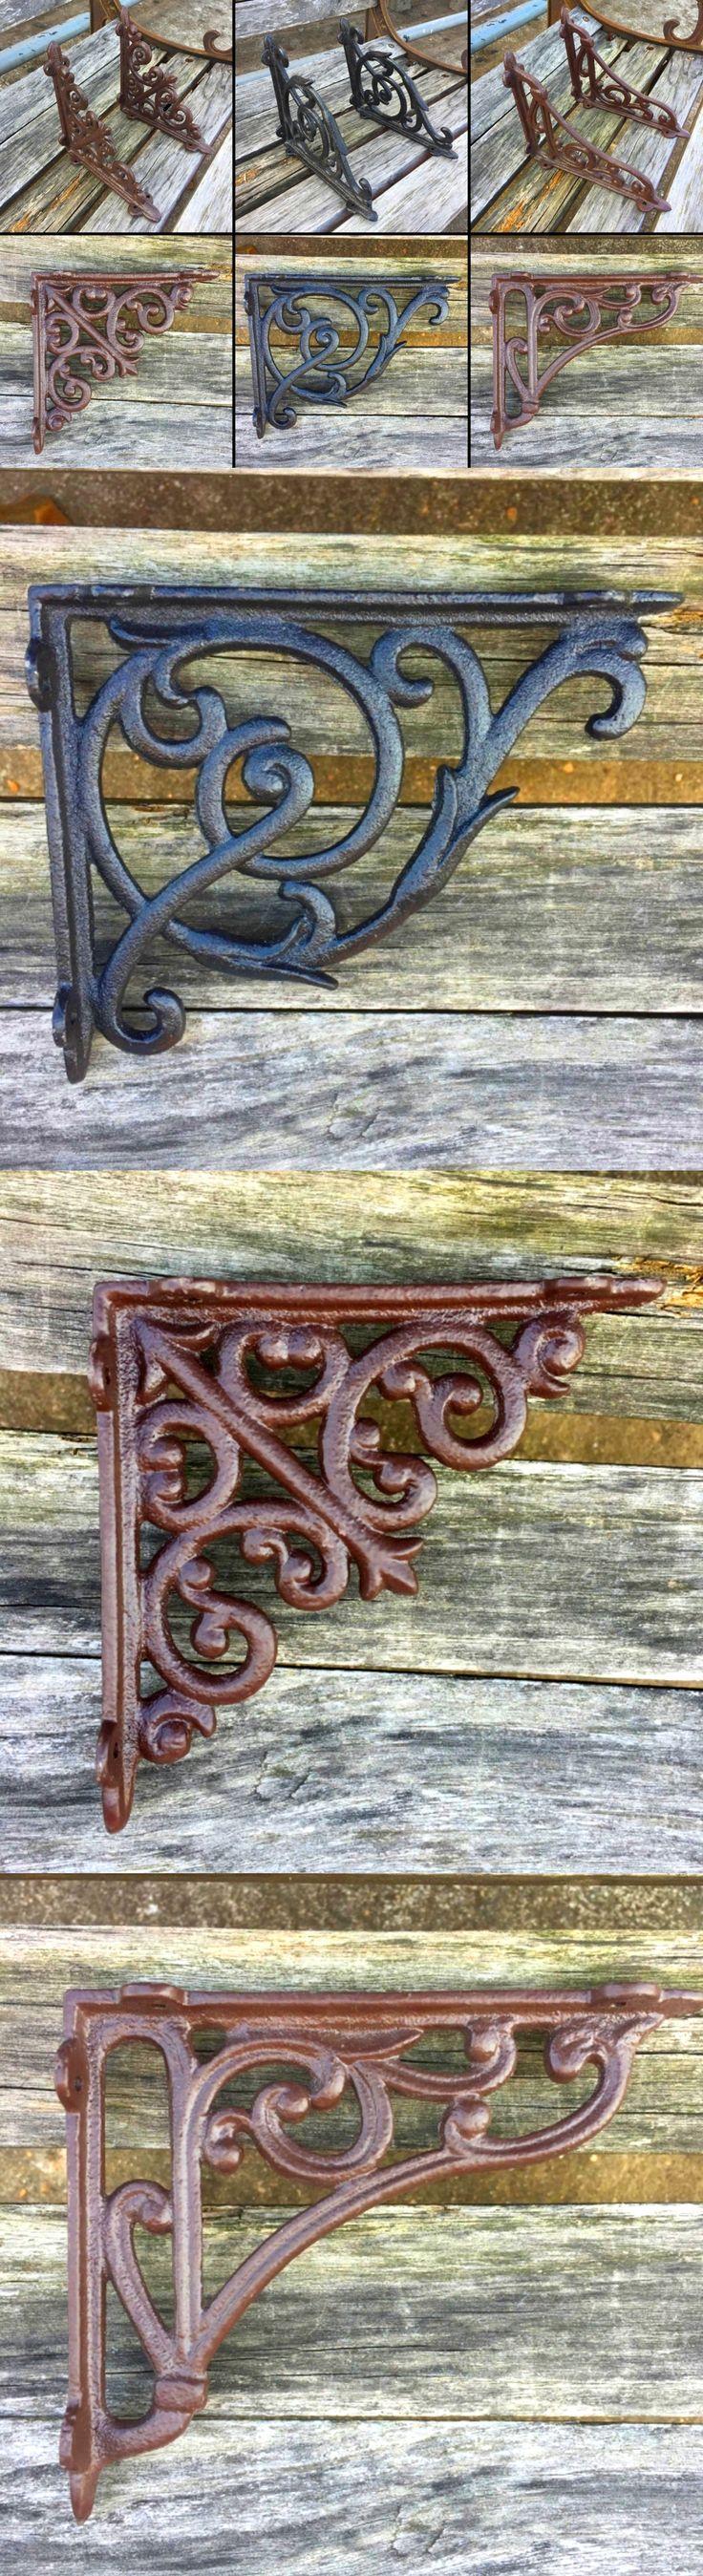 Braces and Brackets 45816: (X2) 4 X4 Heavy Duty Cast Iron Antique Style Garden Wall Brackets Shelf Braces -> BUY IT NOW ONLY: $37.77 on eBay!